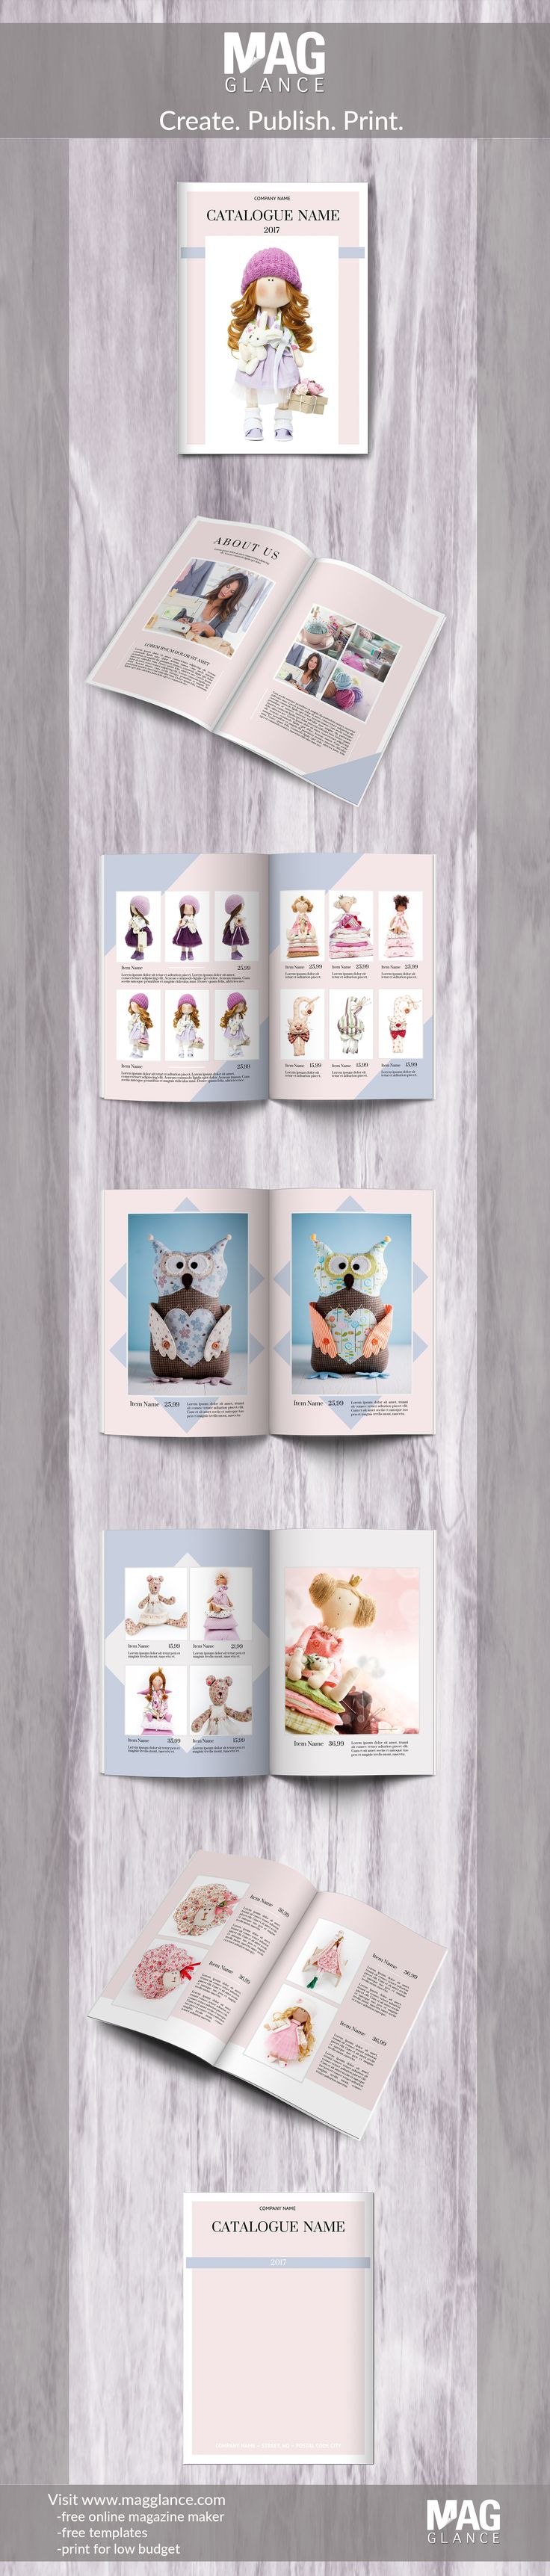 M 225 s de 1000 ideas sobre decoraciones de fiesta de safari en pinterest - Crea Gratis Tu Cat Logo Online E Impr Melo A Buen Precio En Https Es